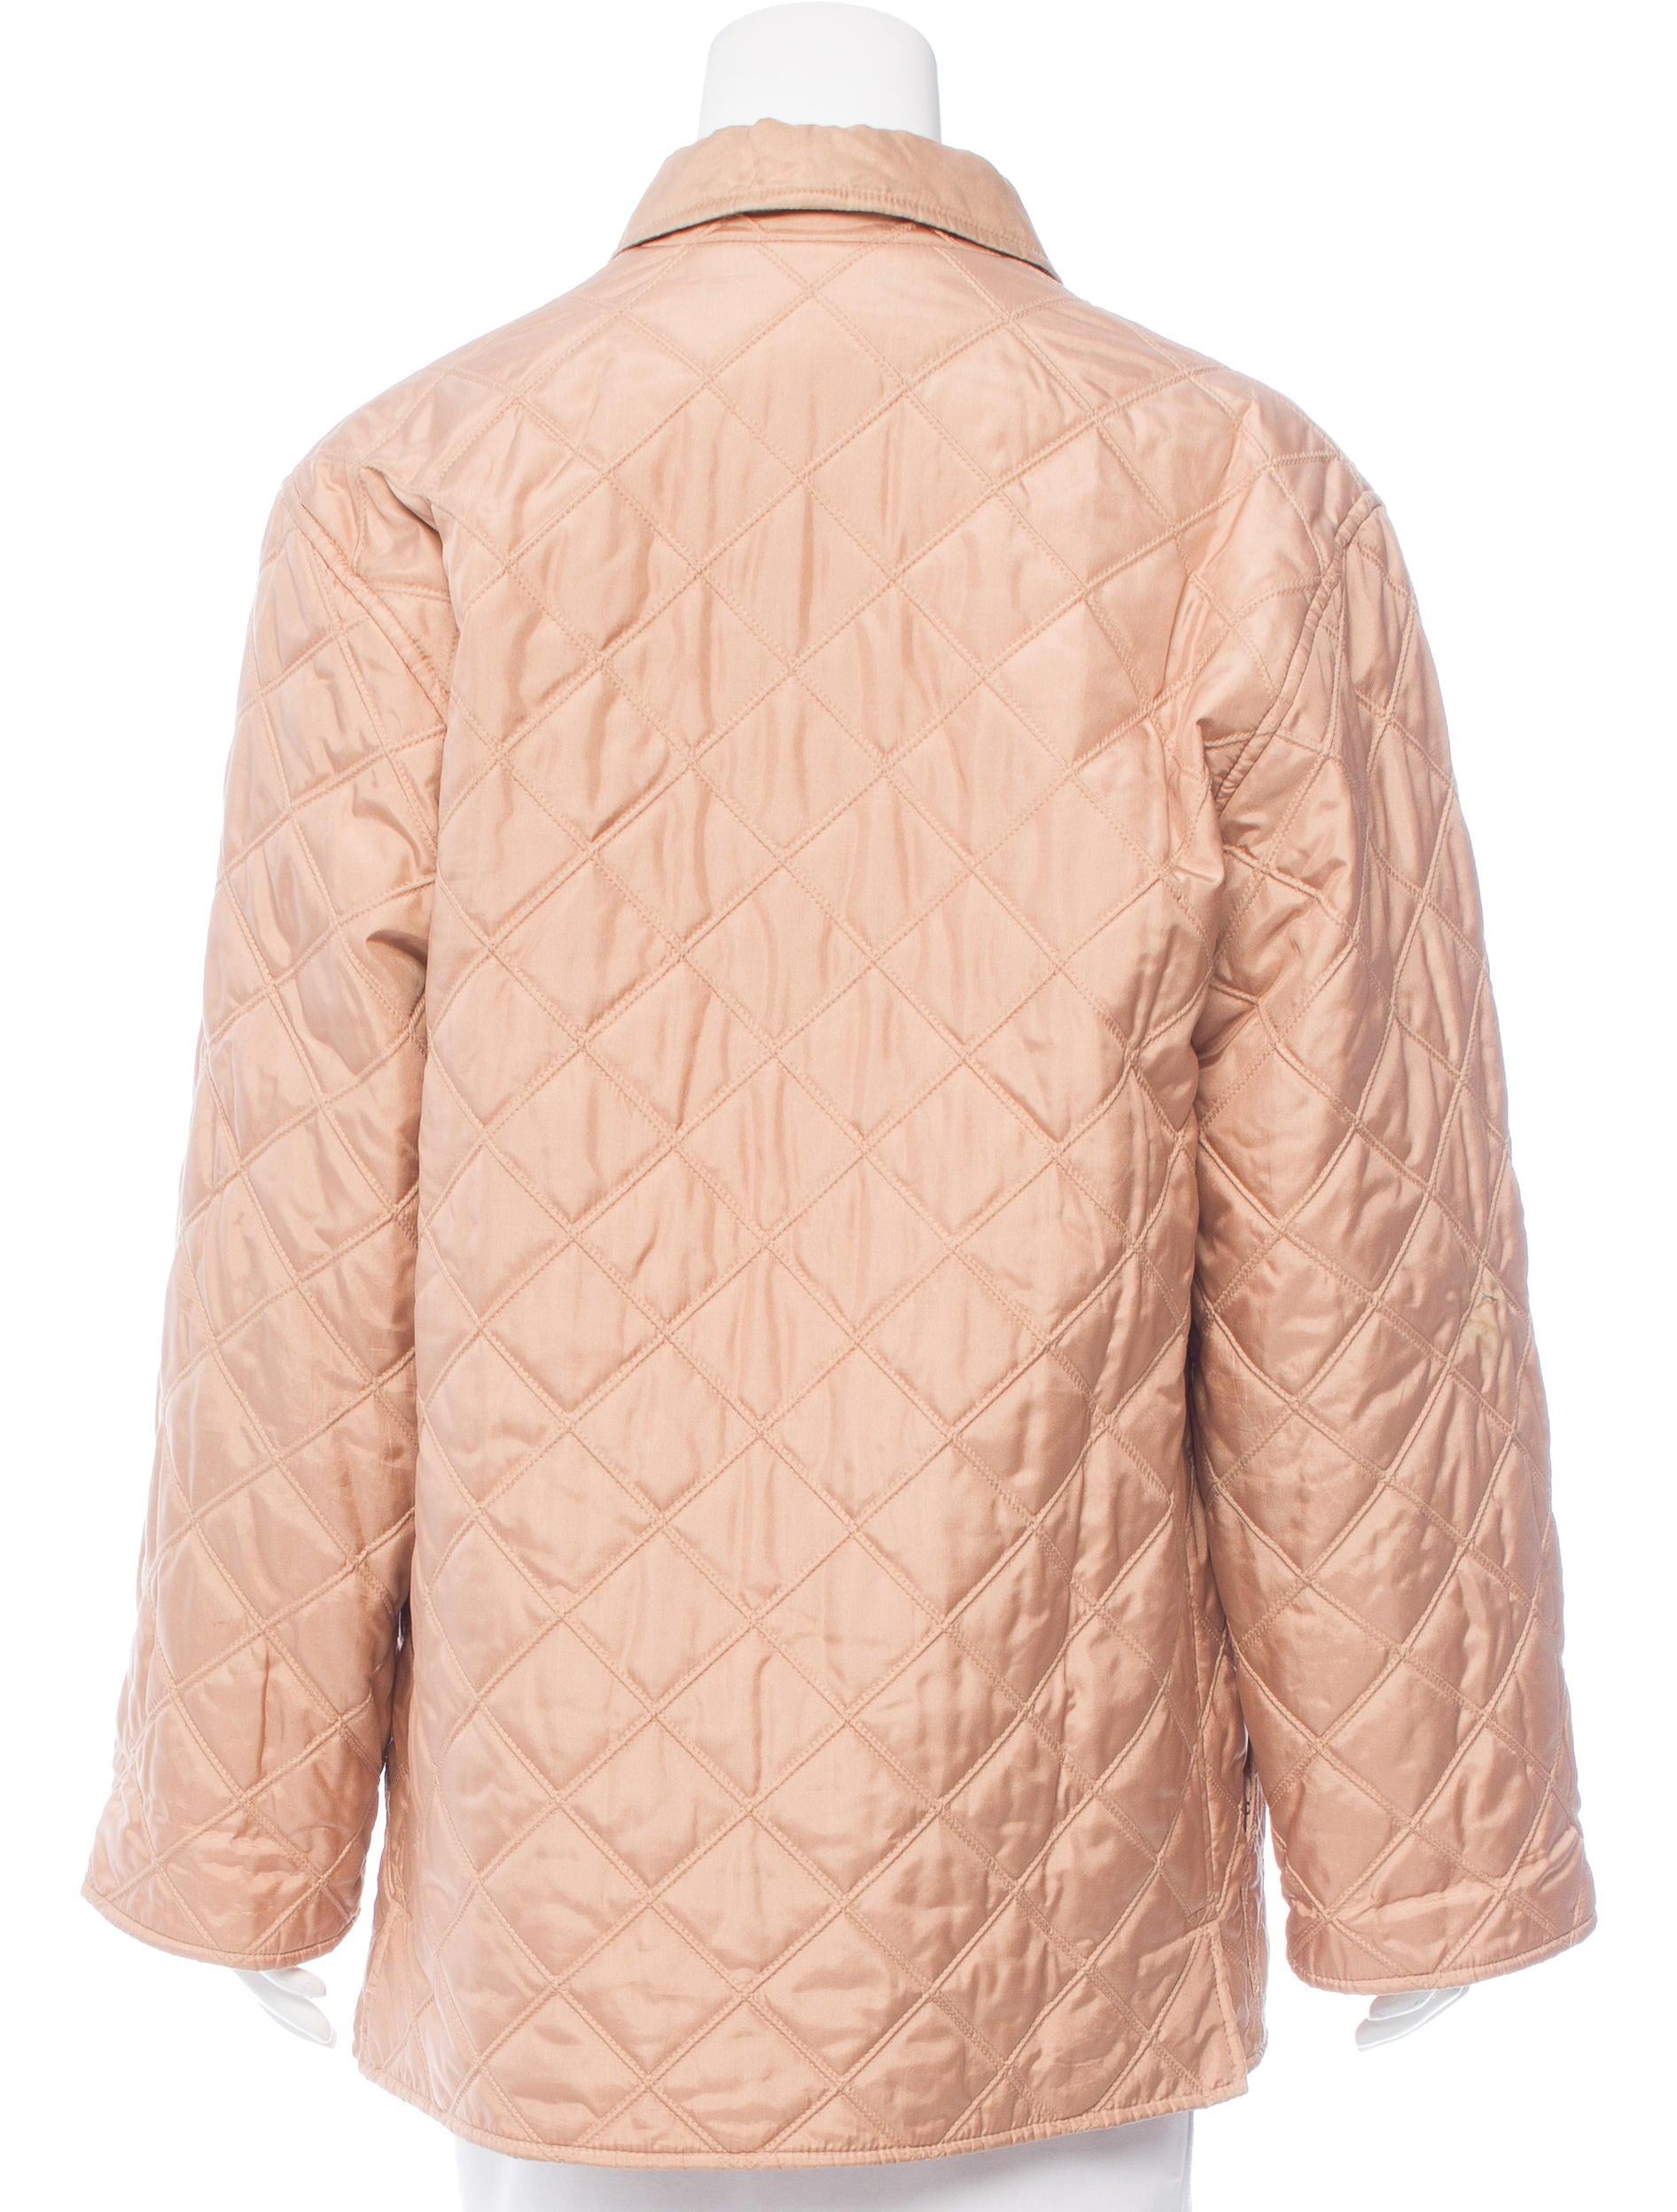 Salvatore Ferragamo Lightweight Quilted Jacket Clothing